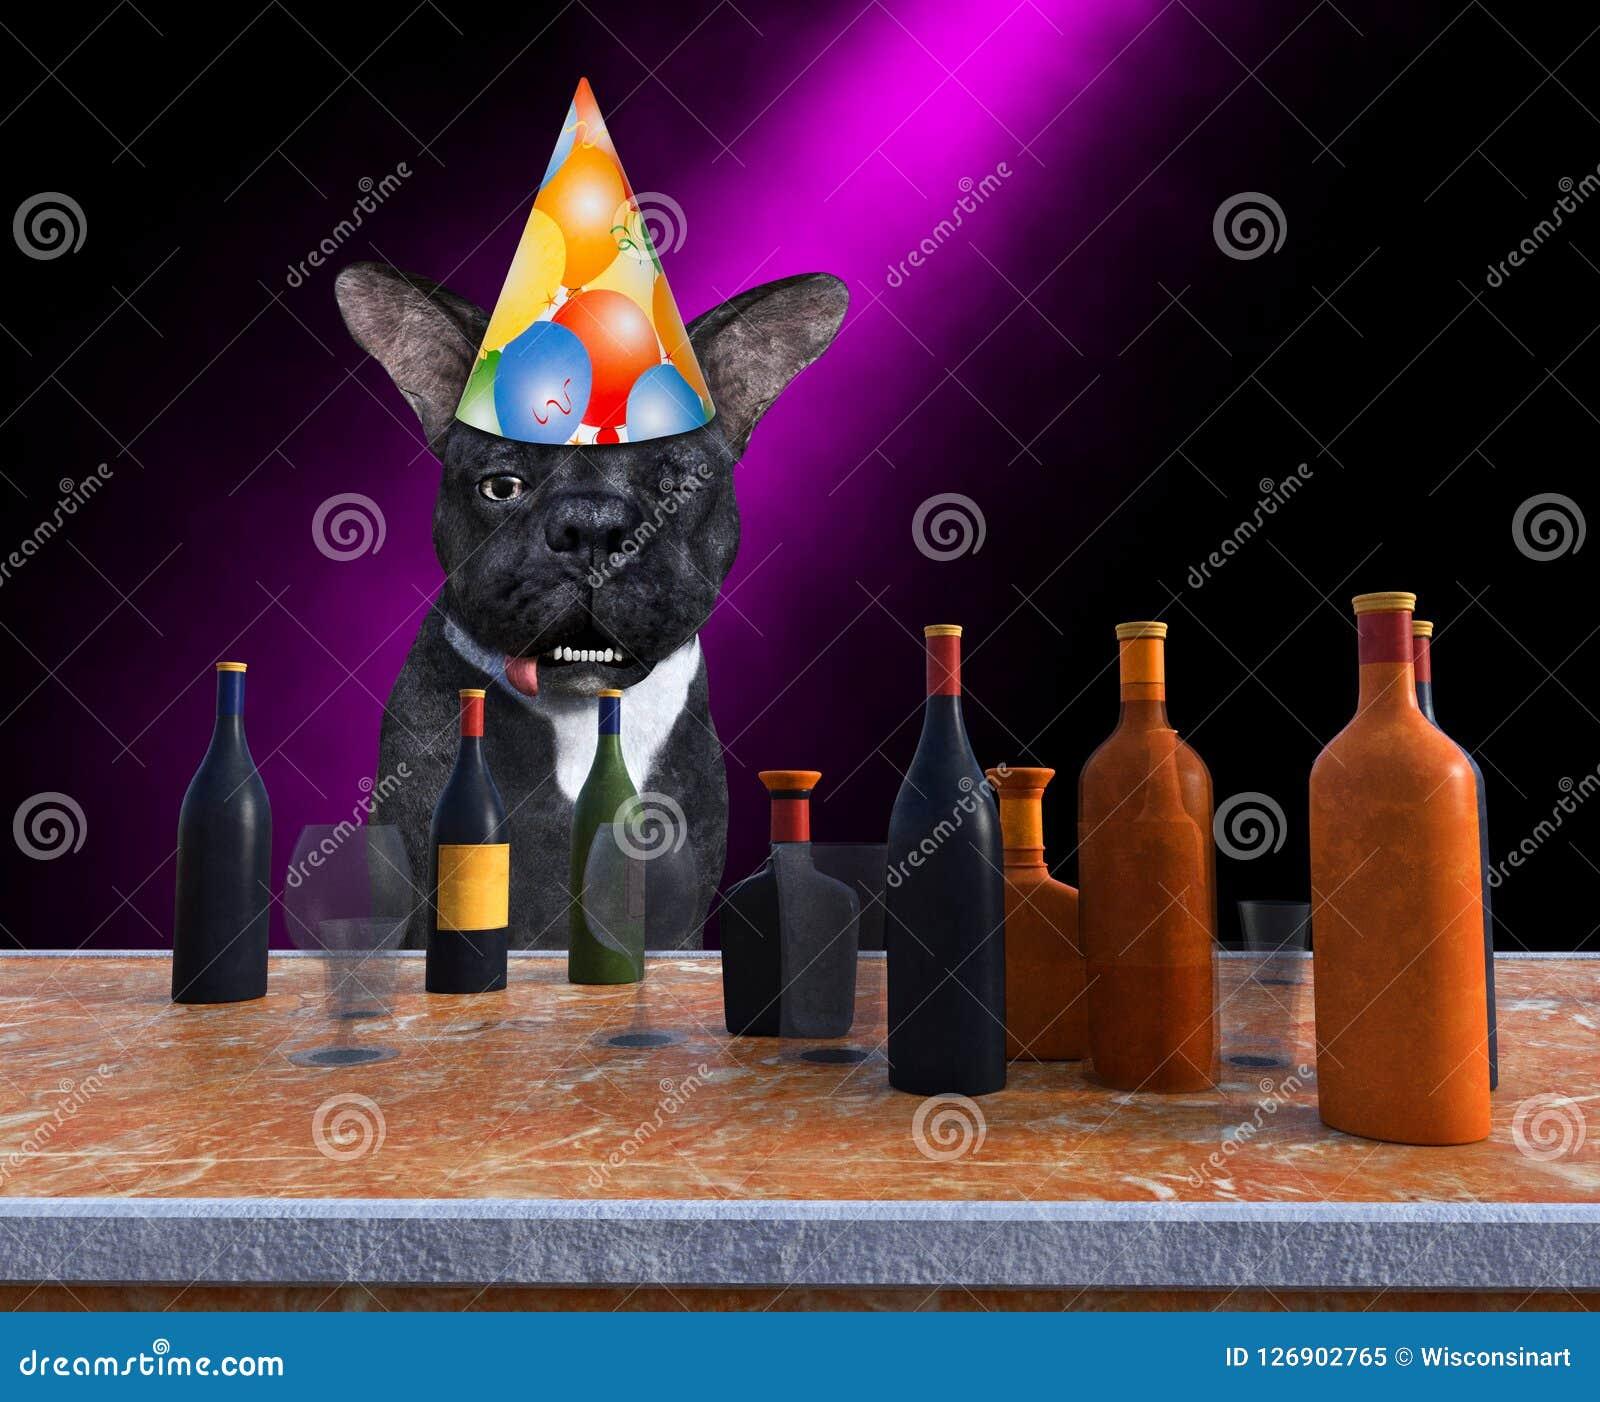 Funny Happy Birthday Party Dog, Drinking, Alcohol